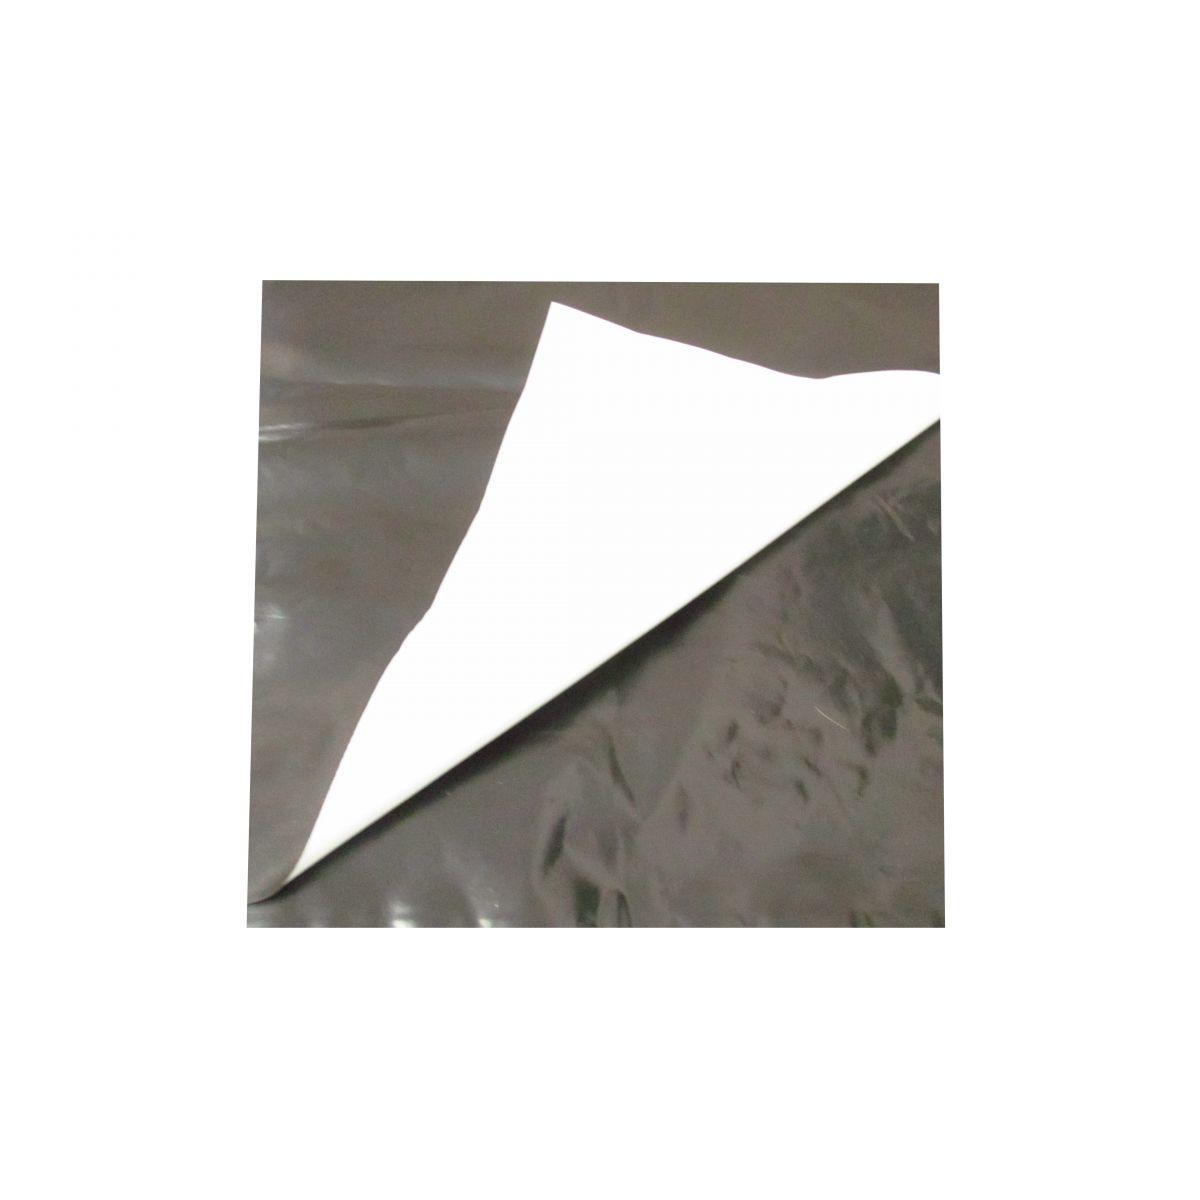 Lona Plastica Preta e Branca 10m x 4m 150 Micras  - Casafaz